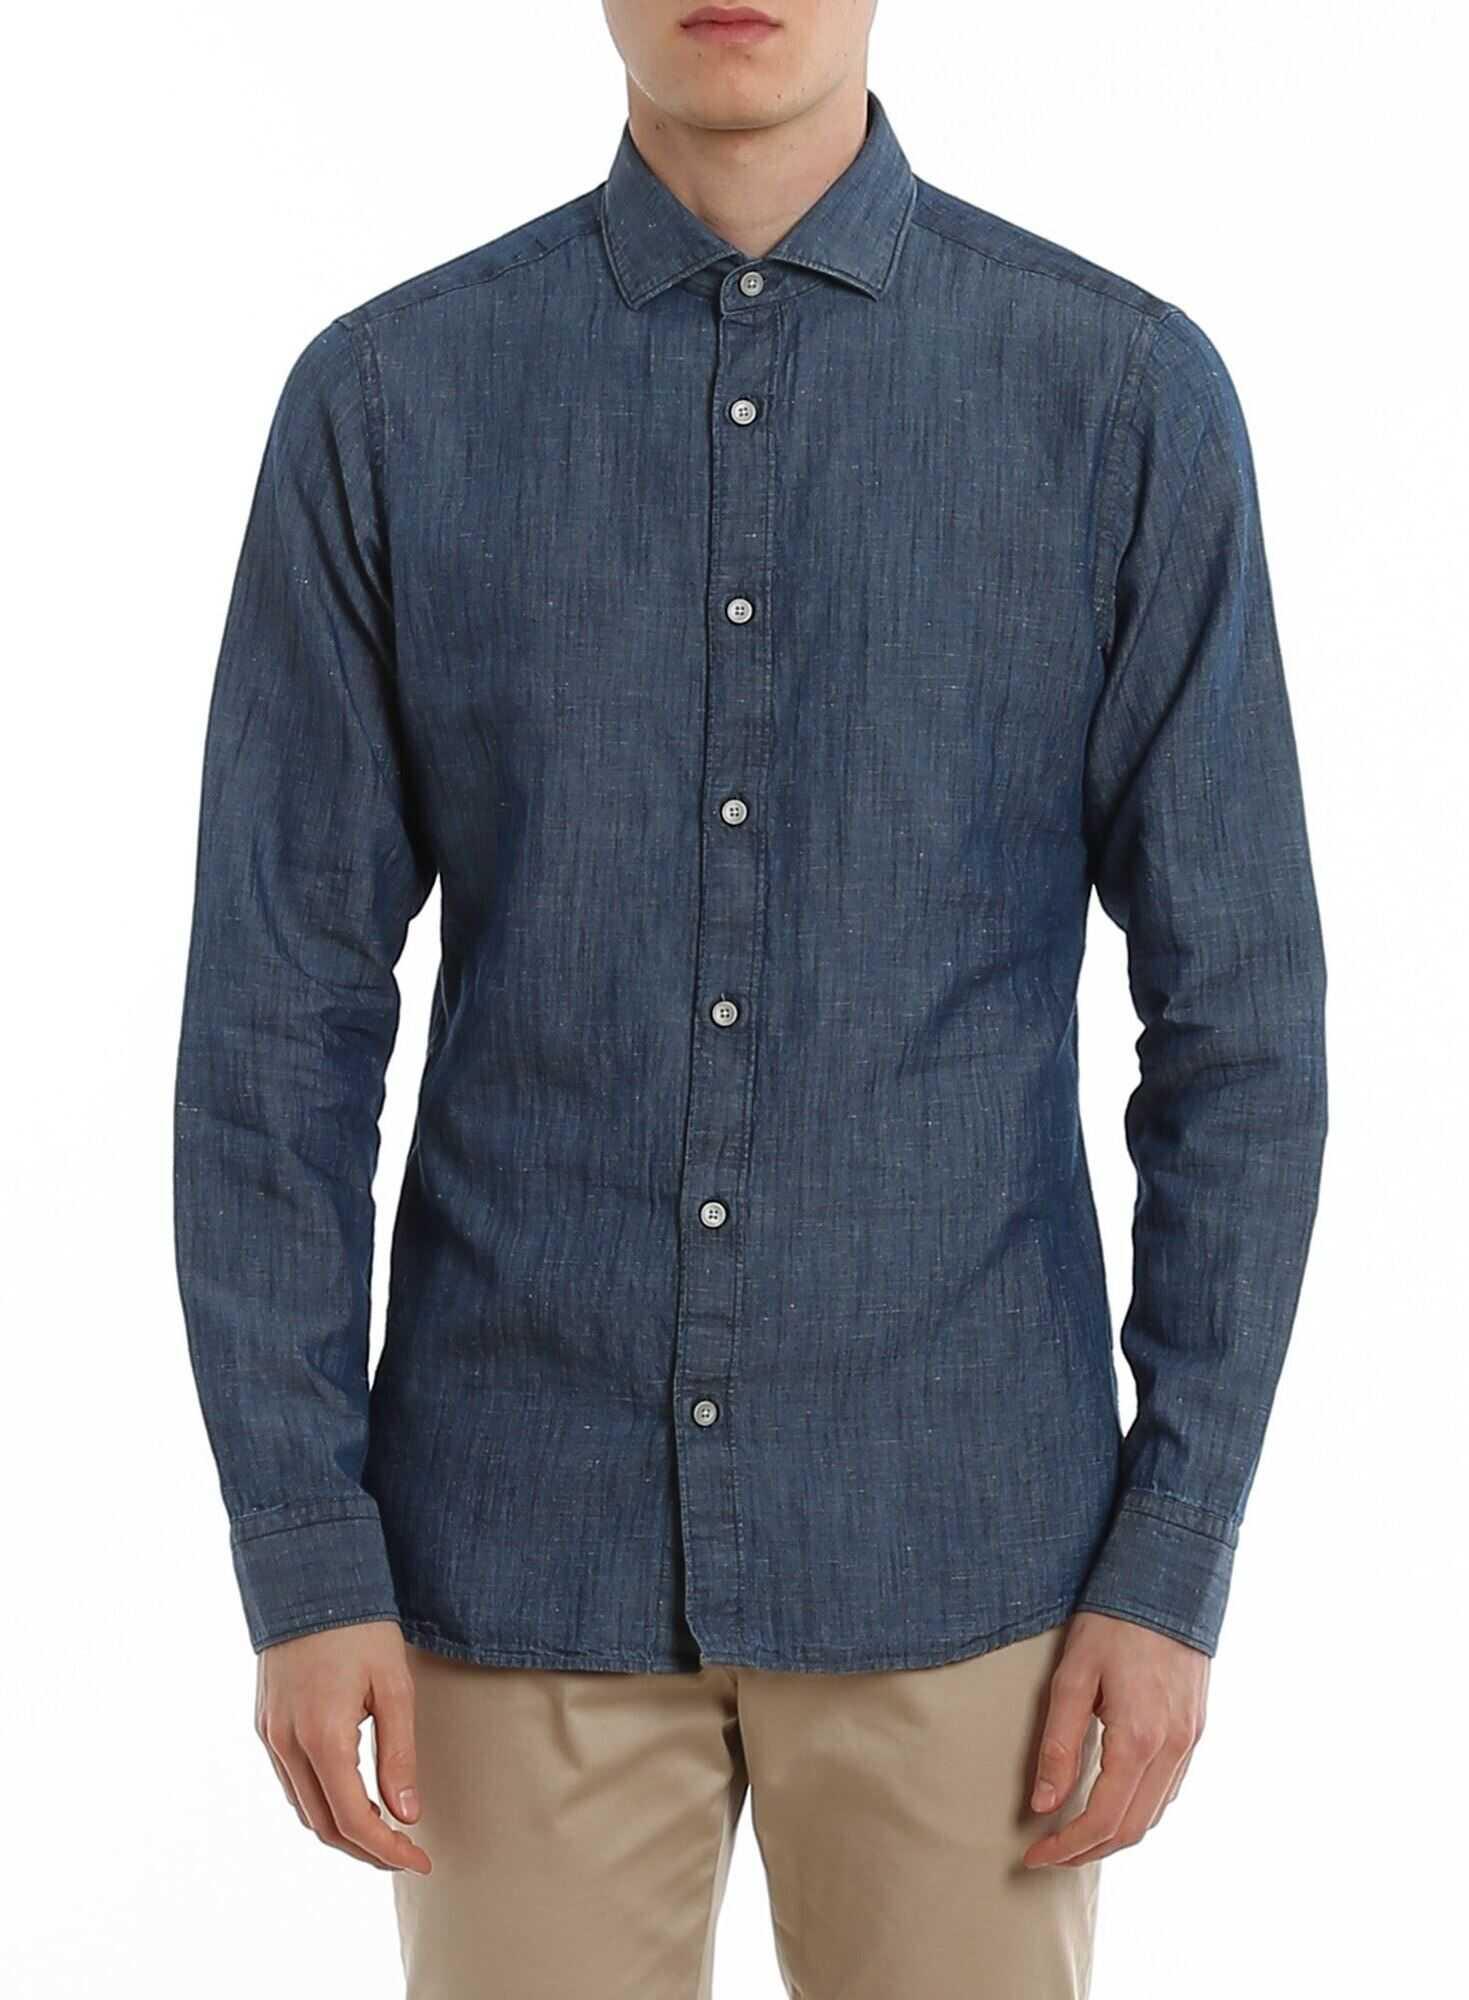 Z Zegna Denim Shirt In Blue Blue imagine